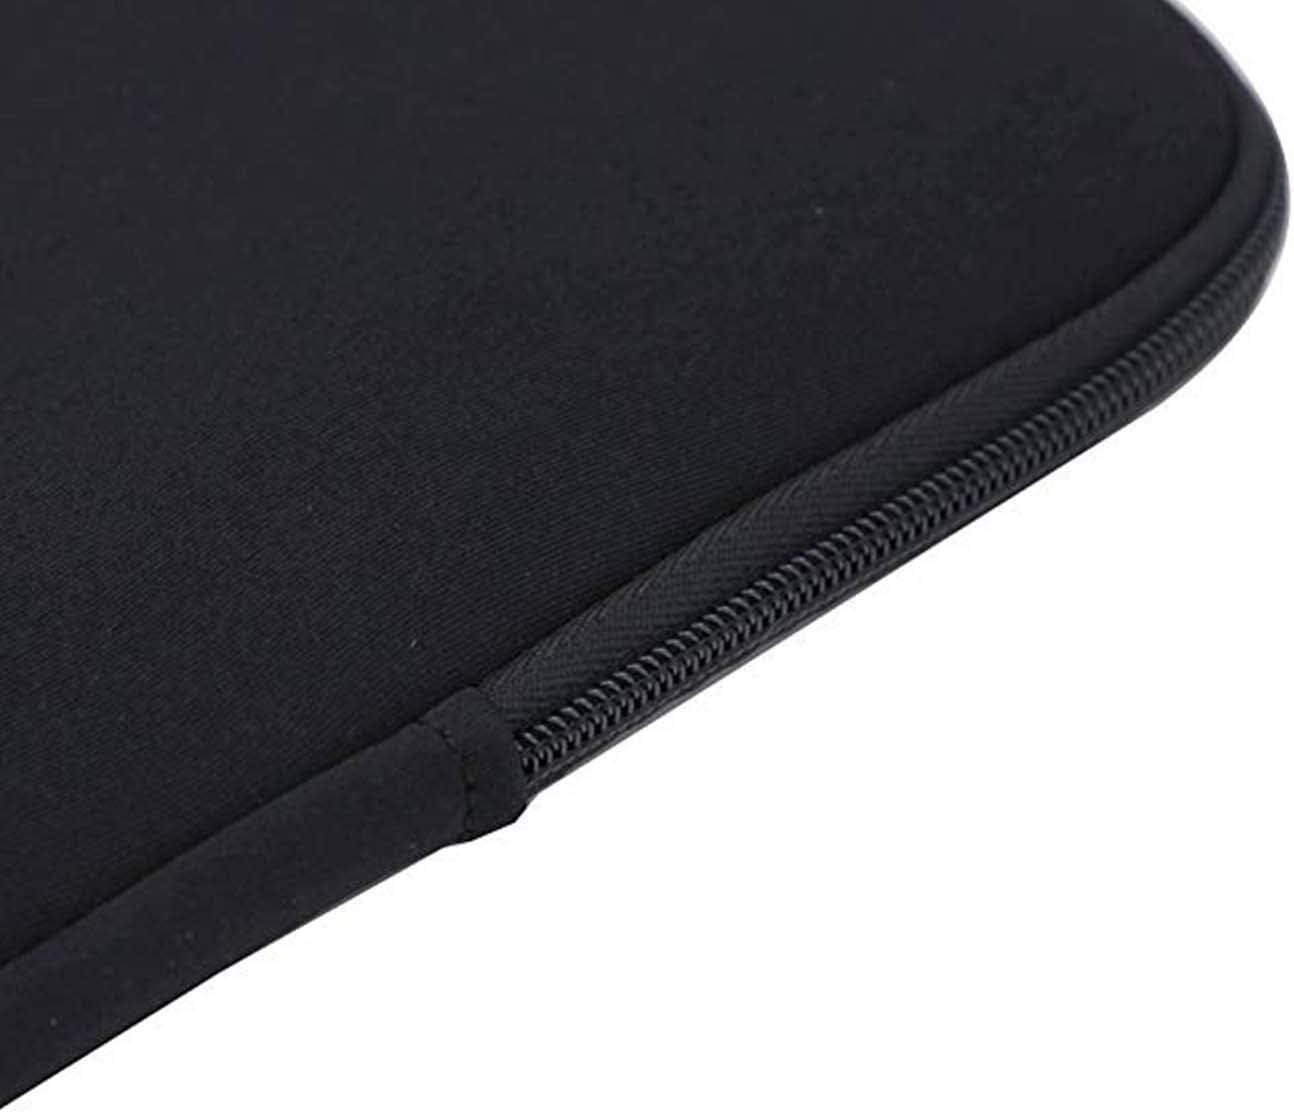 VEGAS Jurassic Dinosaur Pattern Laptop Sleeve Case Bag Handbag for MacBook Lightweight Carring Protector for Samsung Sony ASUS Acer Lenovo Dell HP Toshiba Chromebook Computers